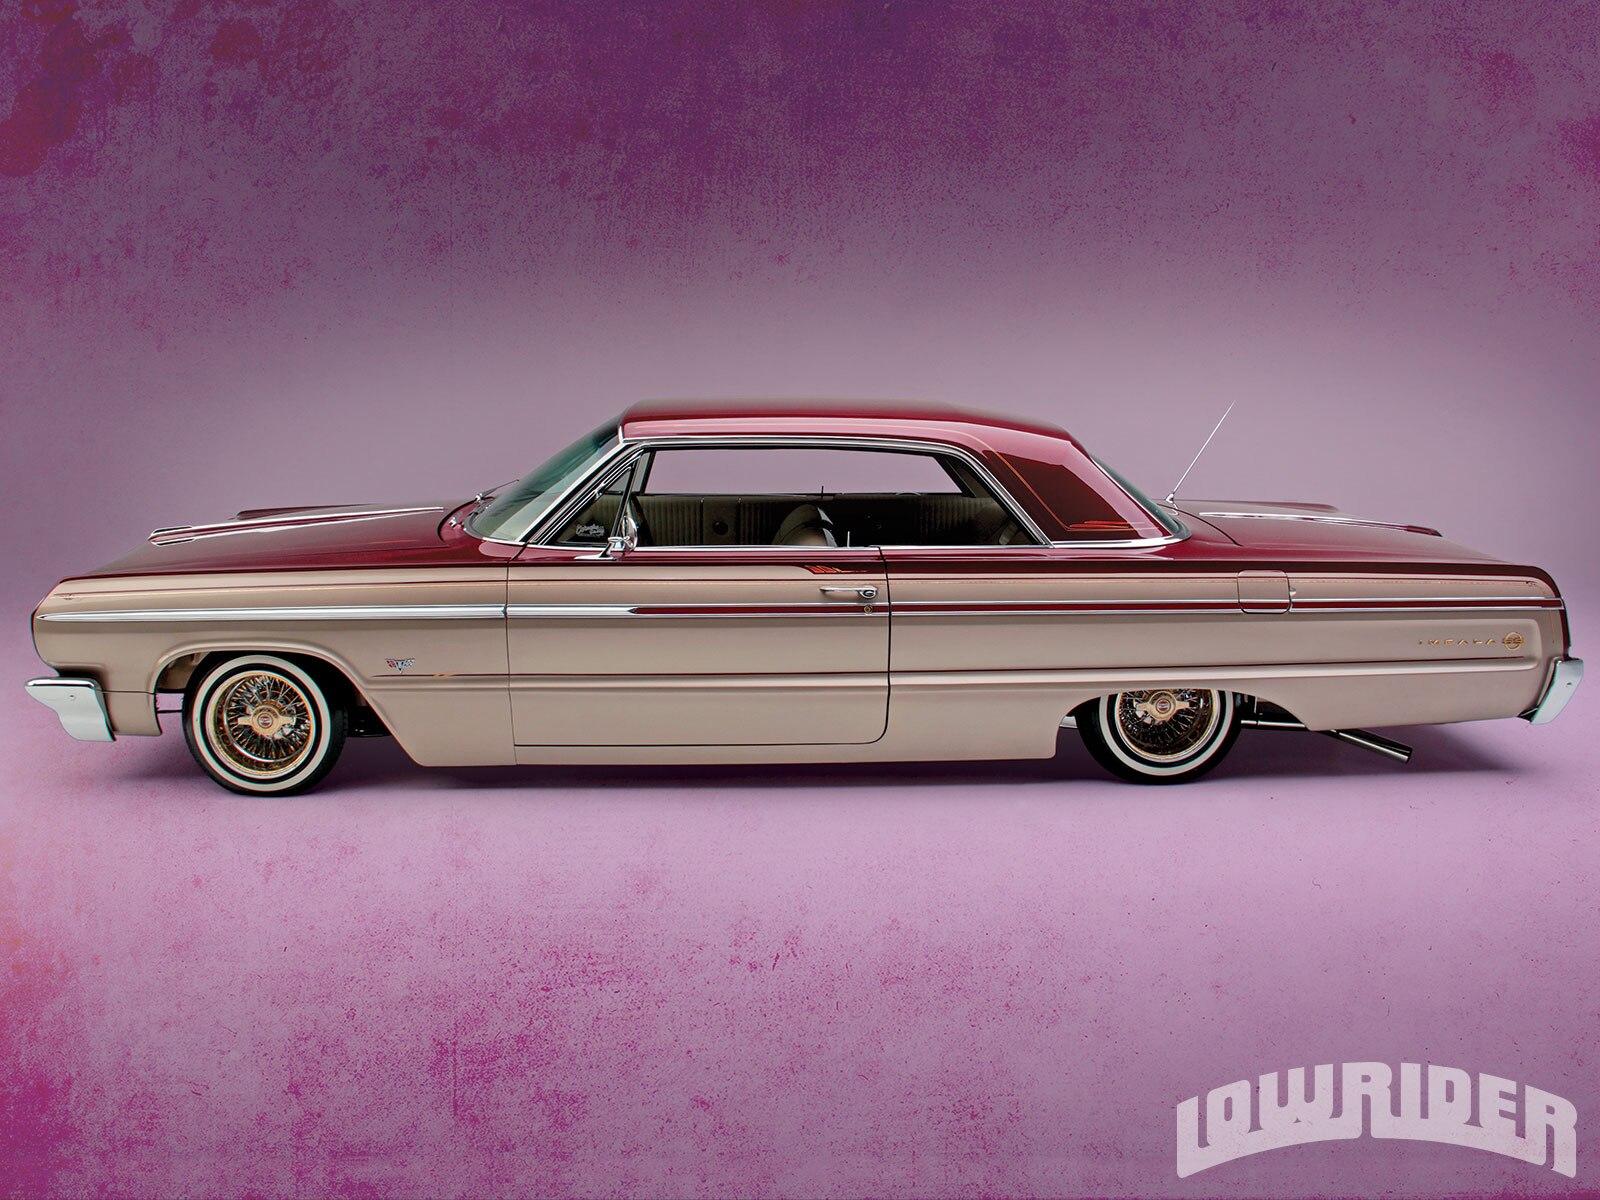 1302-lrmp-12-o-1964-chevrolet-impala-side-view2